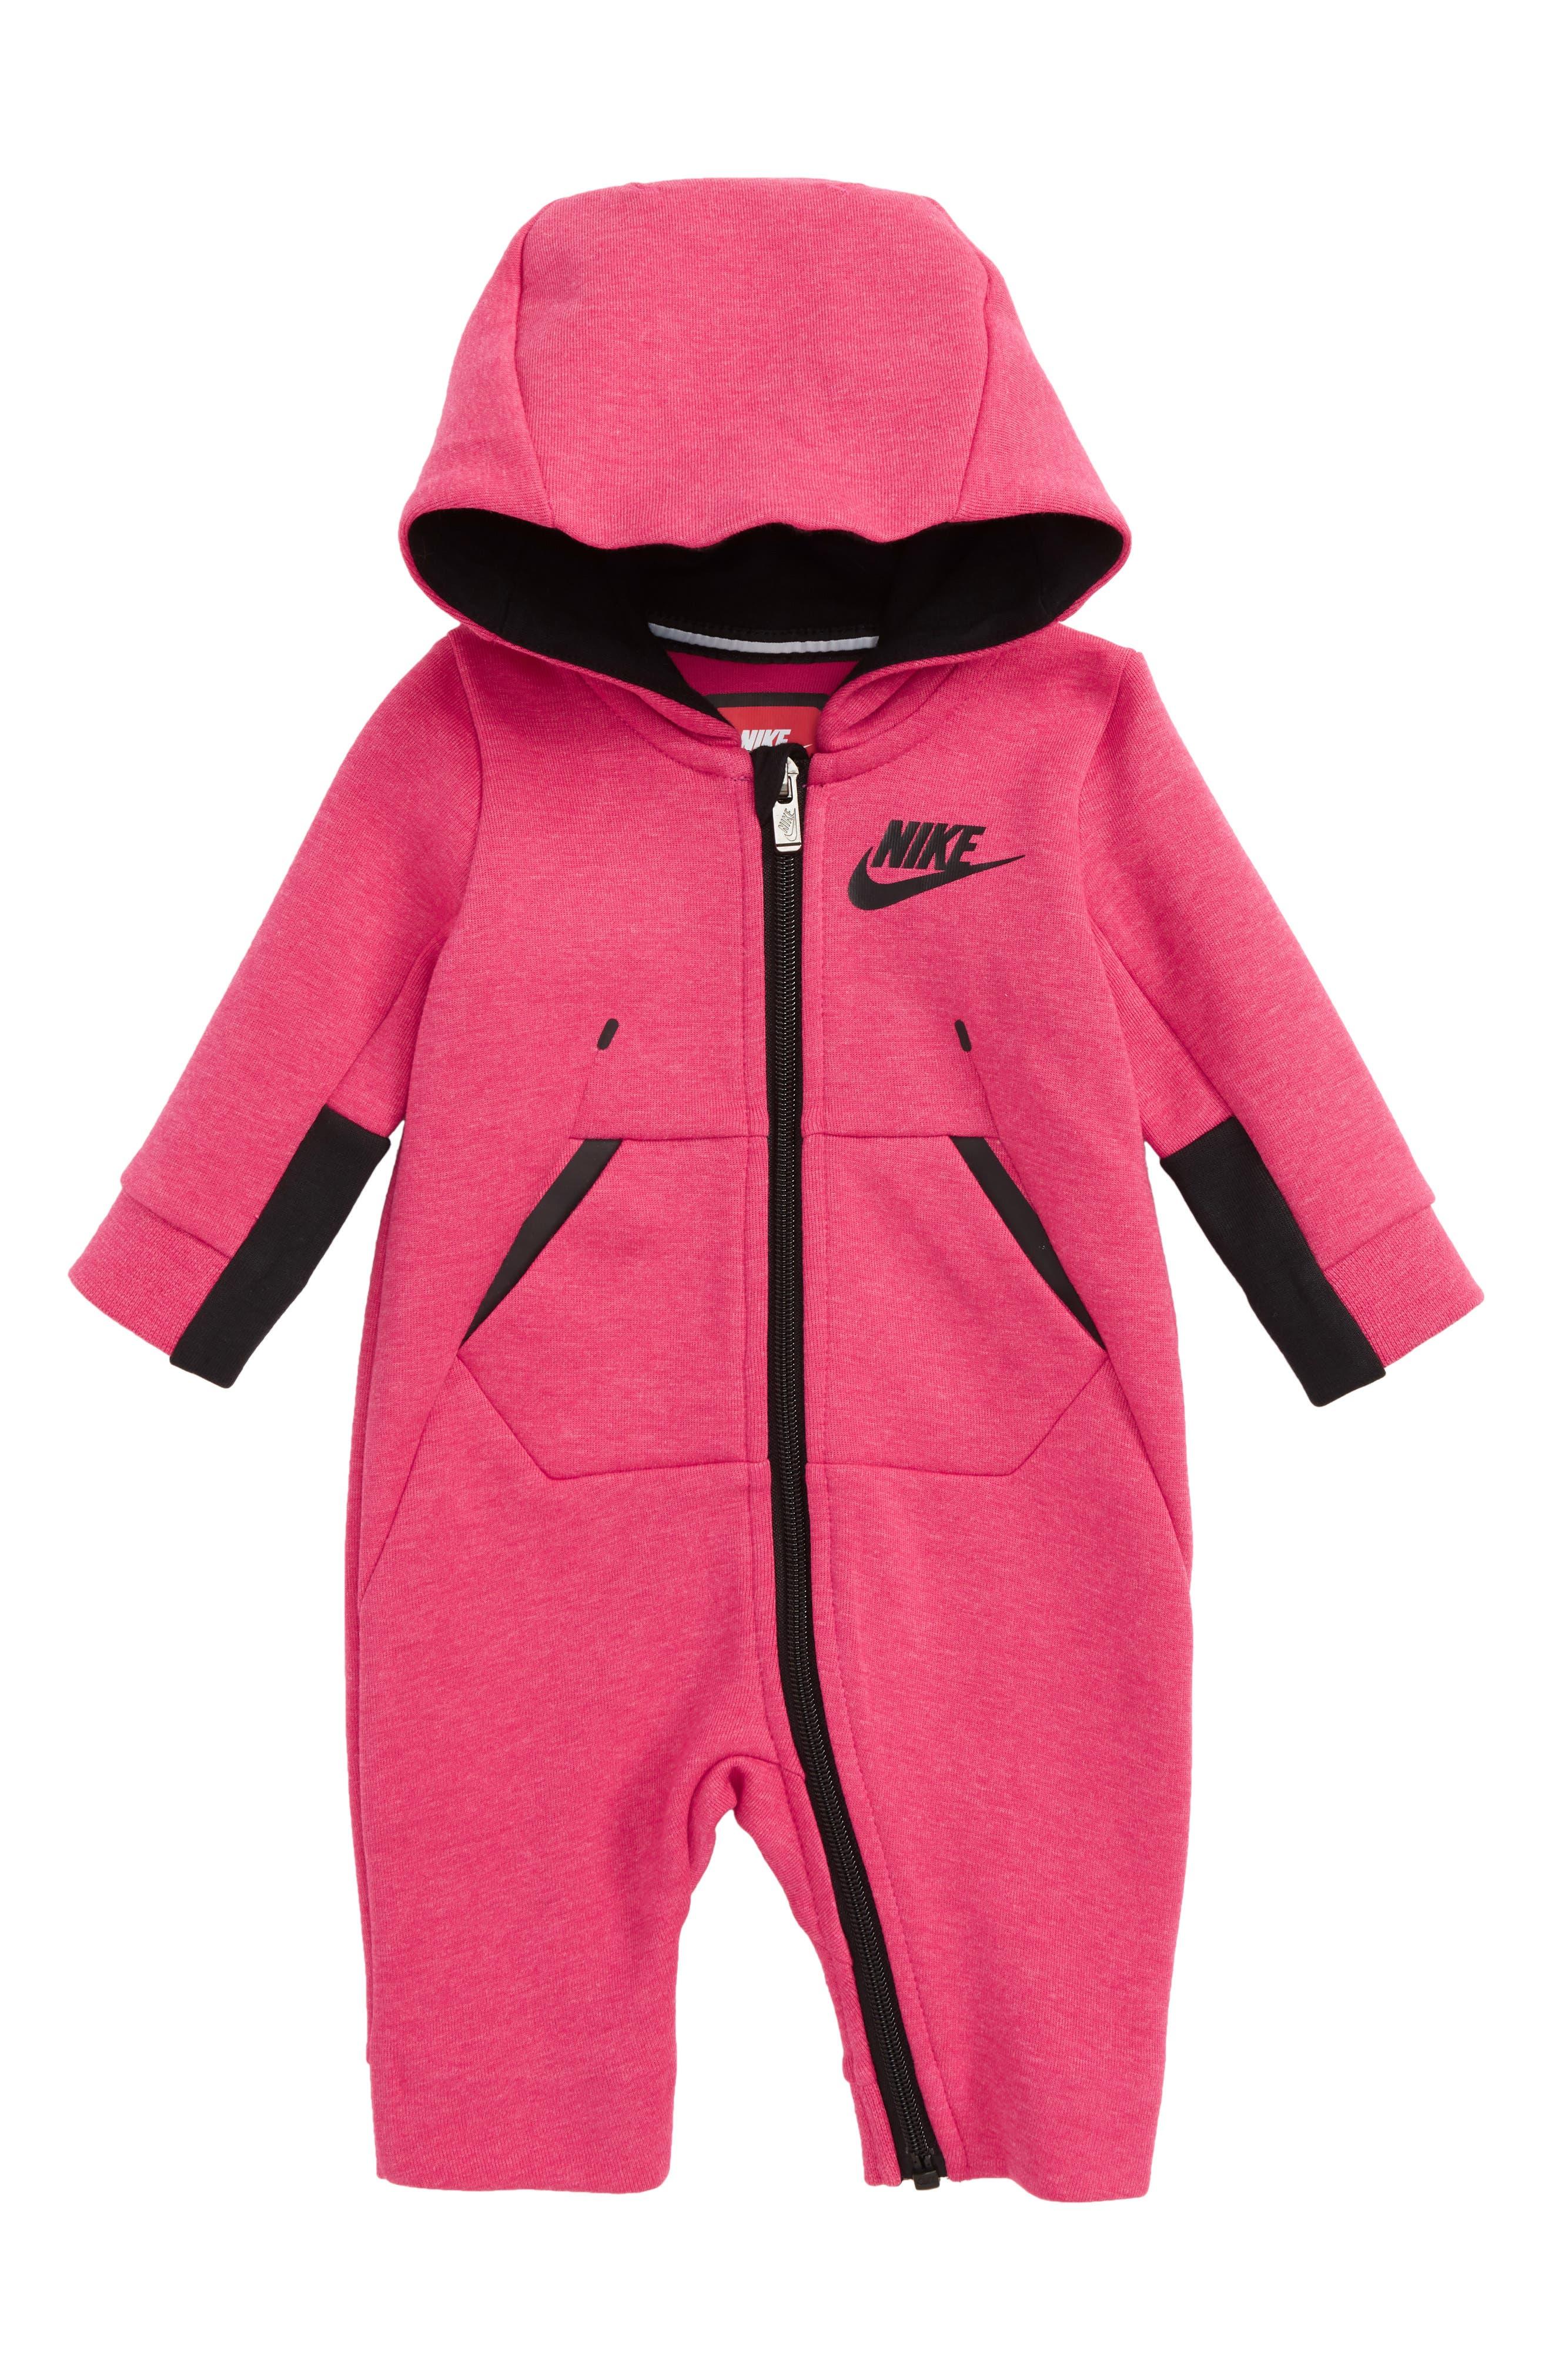 Main Image - Nike Tech Fleece Hooded Romper (Baby Girls)